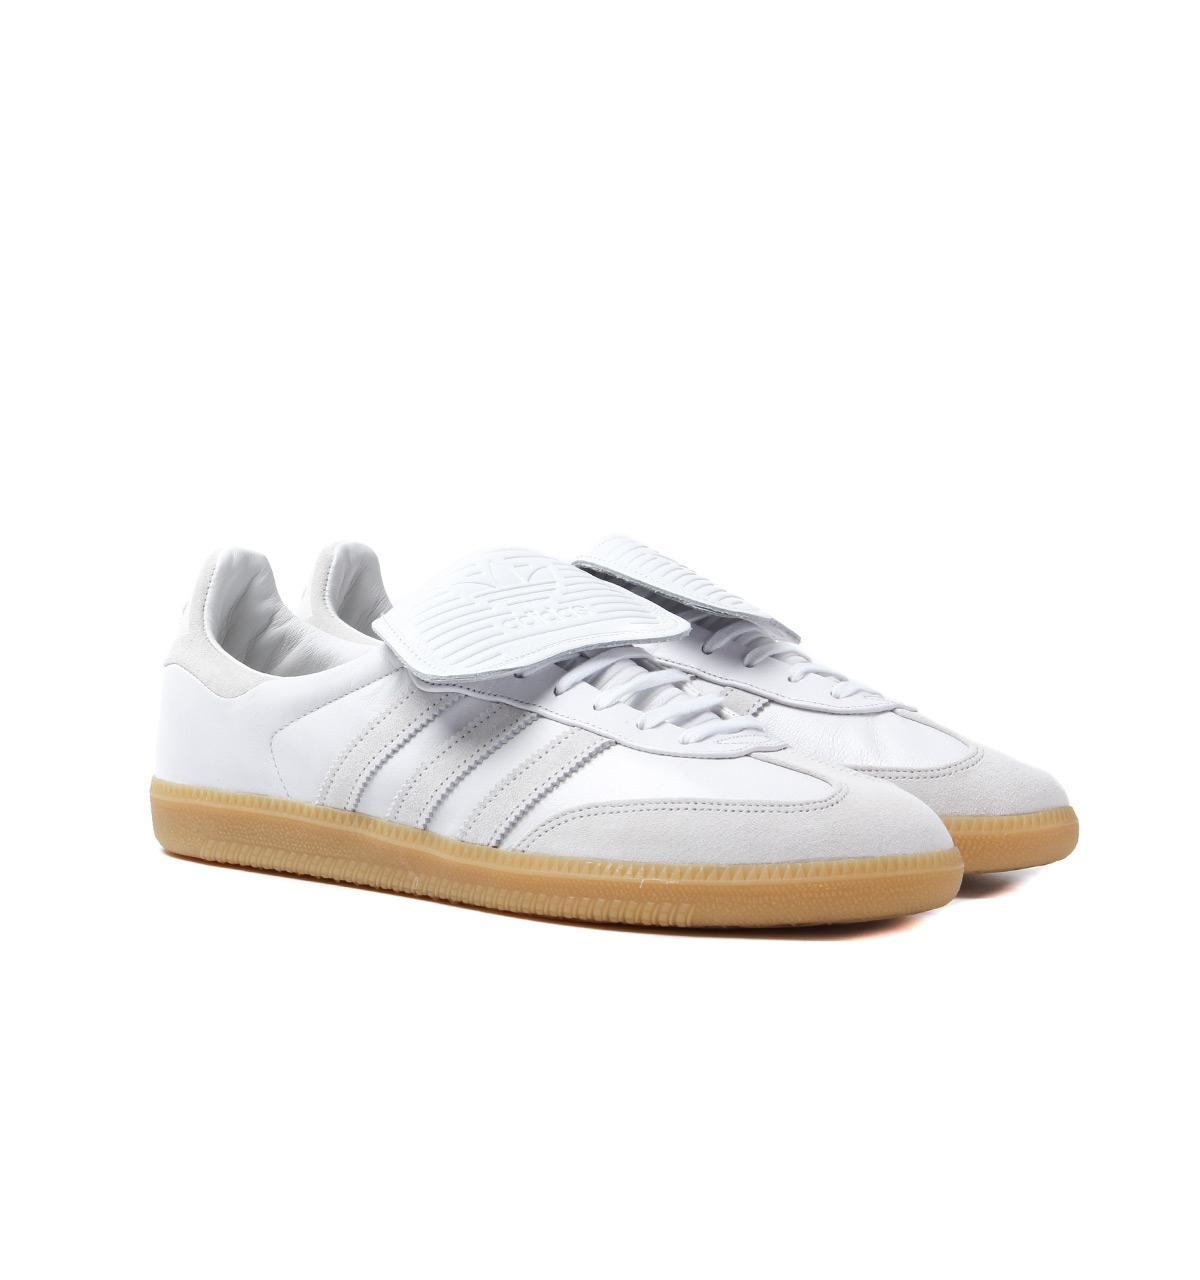 6ccca8bc9ad Lyst - adidas Originals Adidas Samba Recon Lt Crystal White Trainers ...